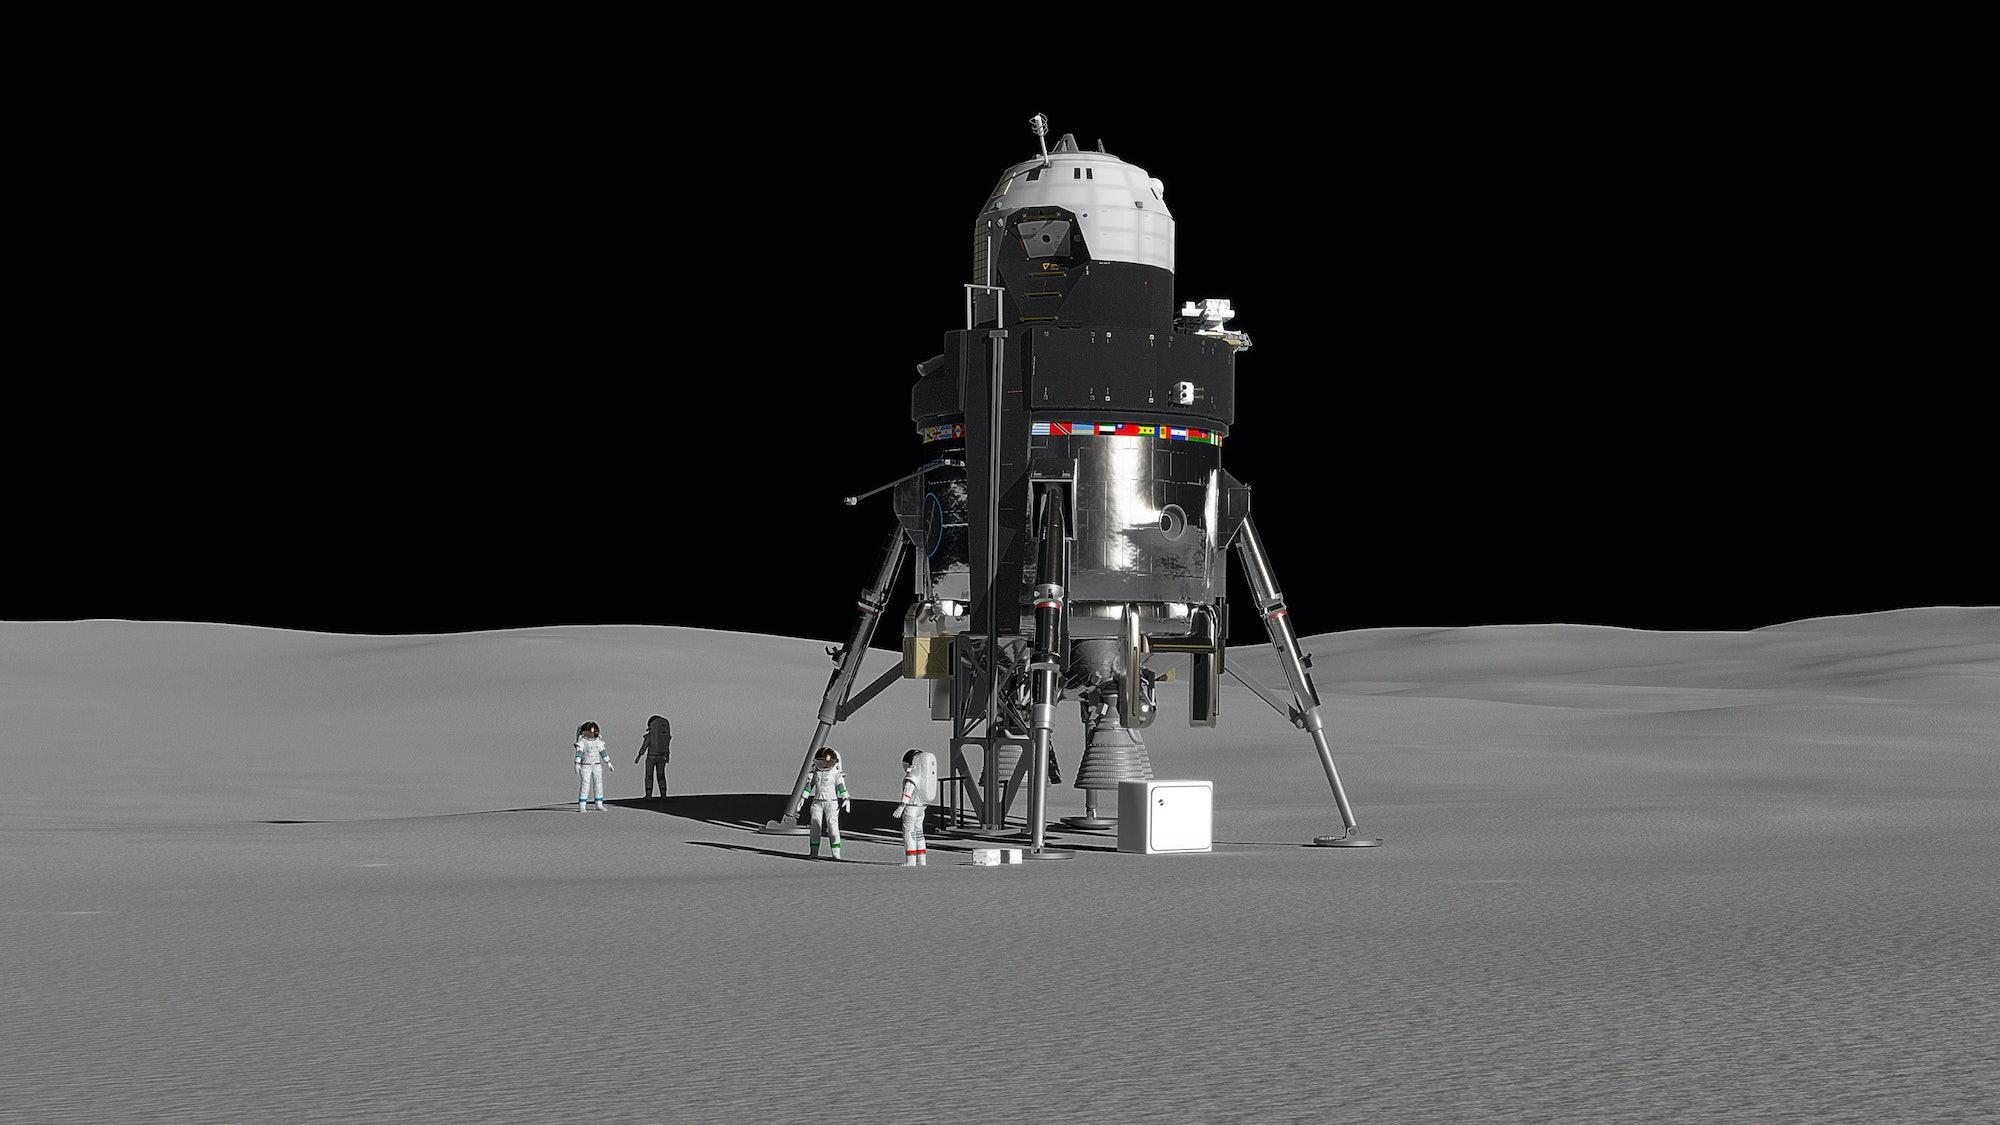 Artist's rendition of Lockheed Martin's lunar lander